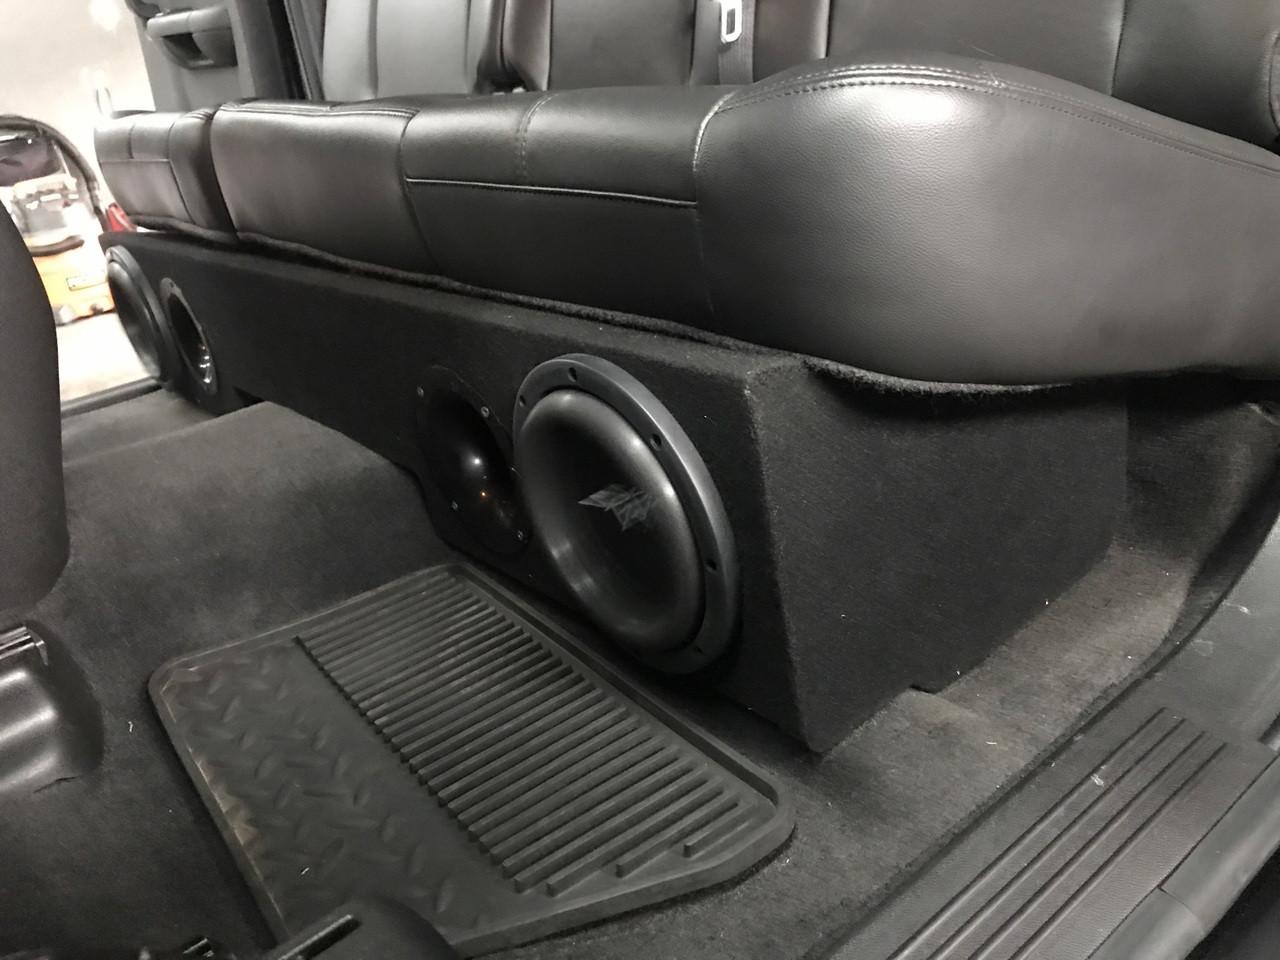 Ported Sub box 07-13 GMC Sierra/Chevy Silverado Extended Cab